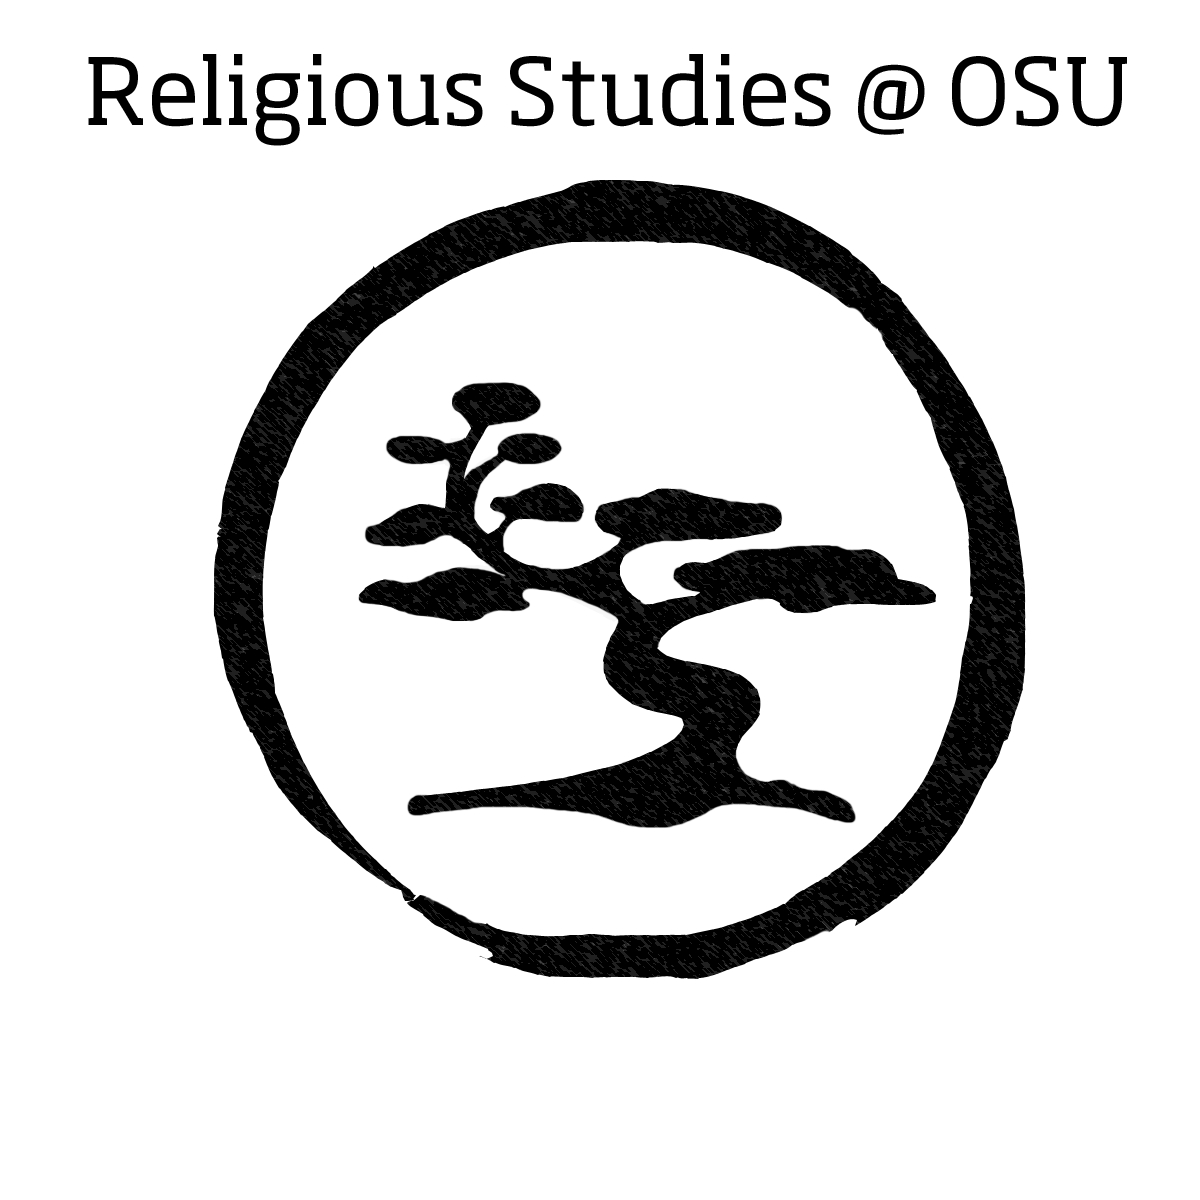 Religious Studies: College Of Liberal Arts